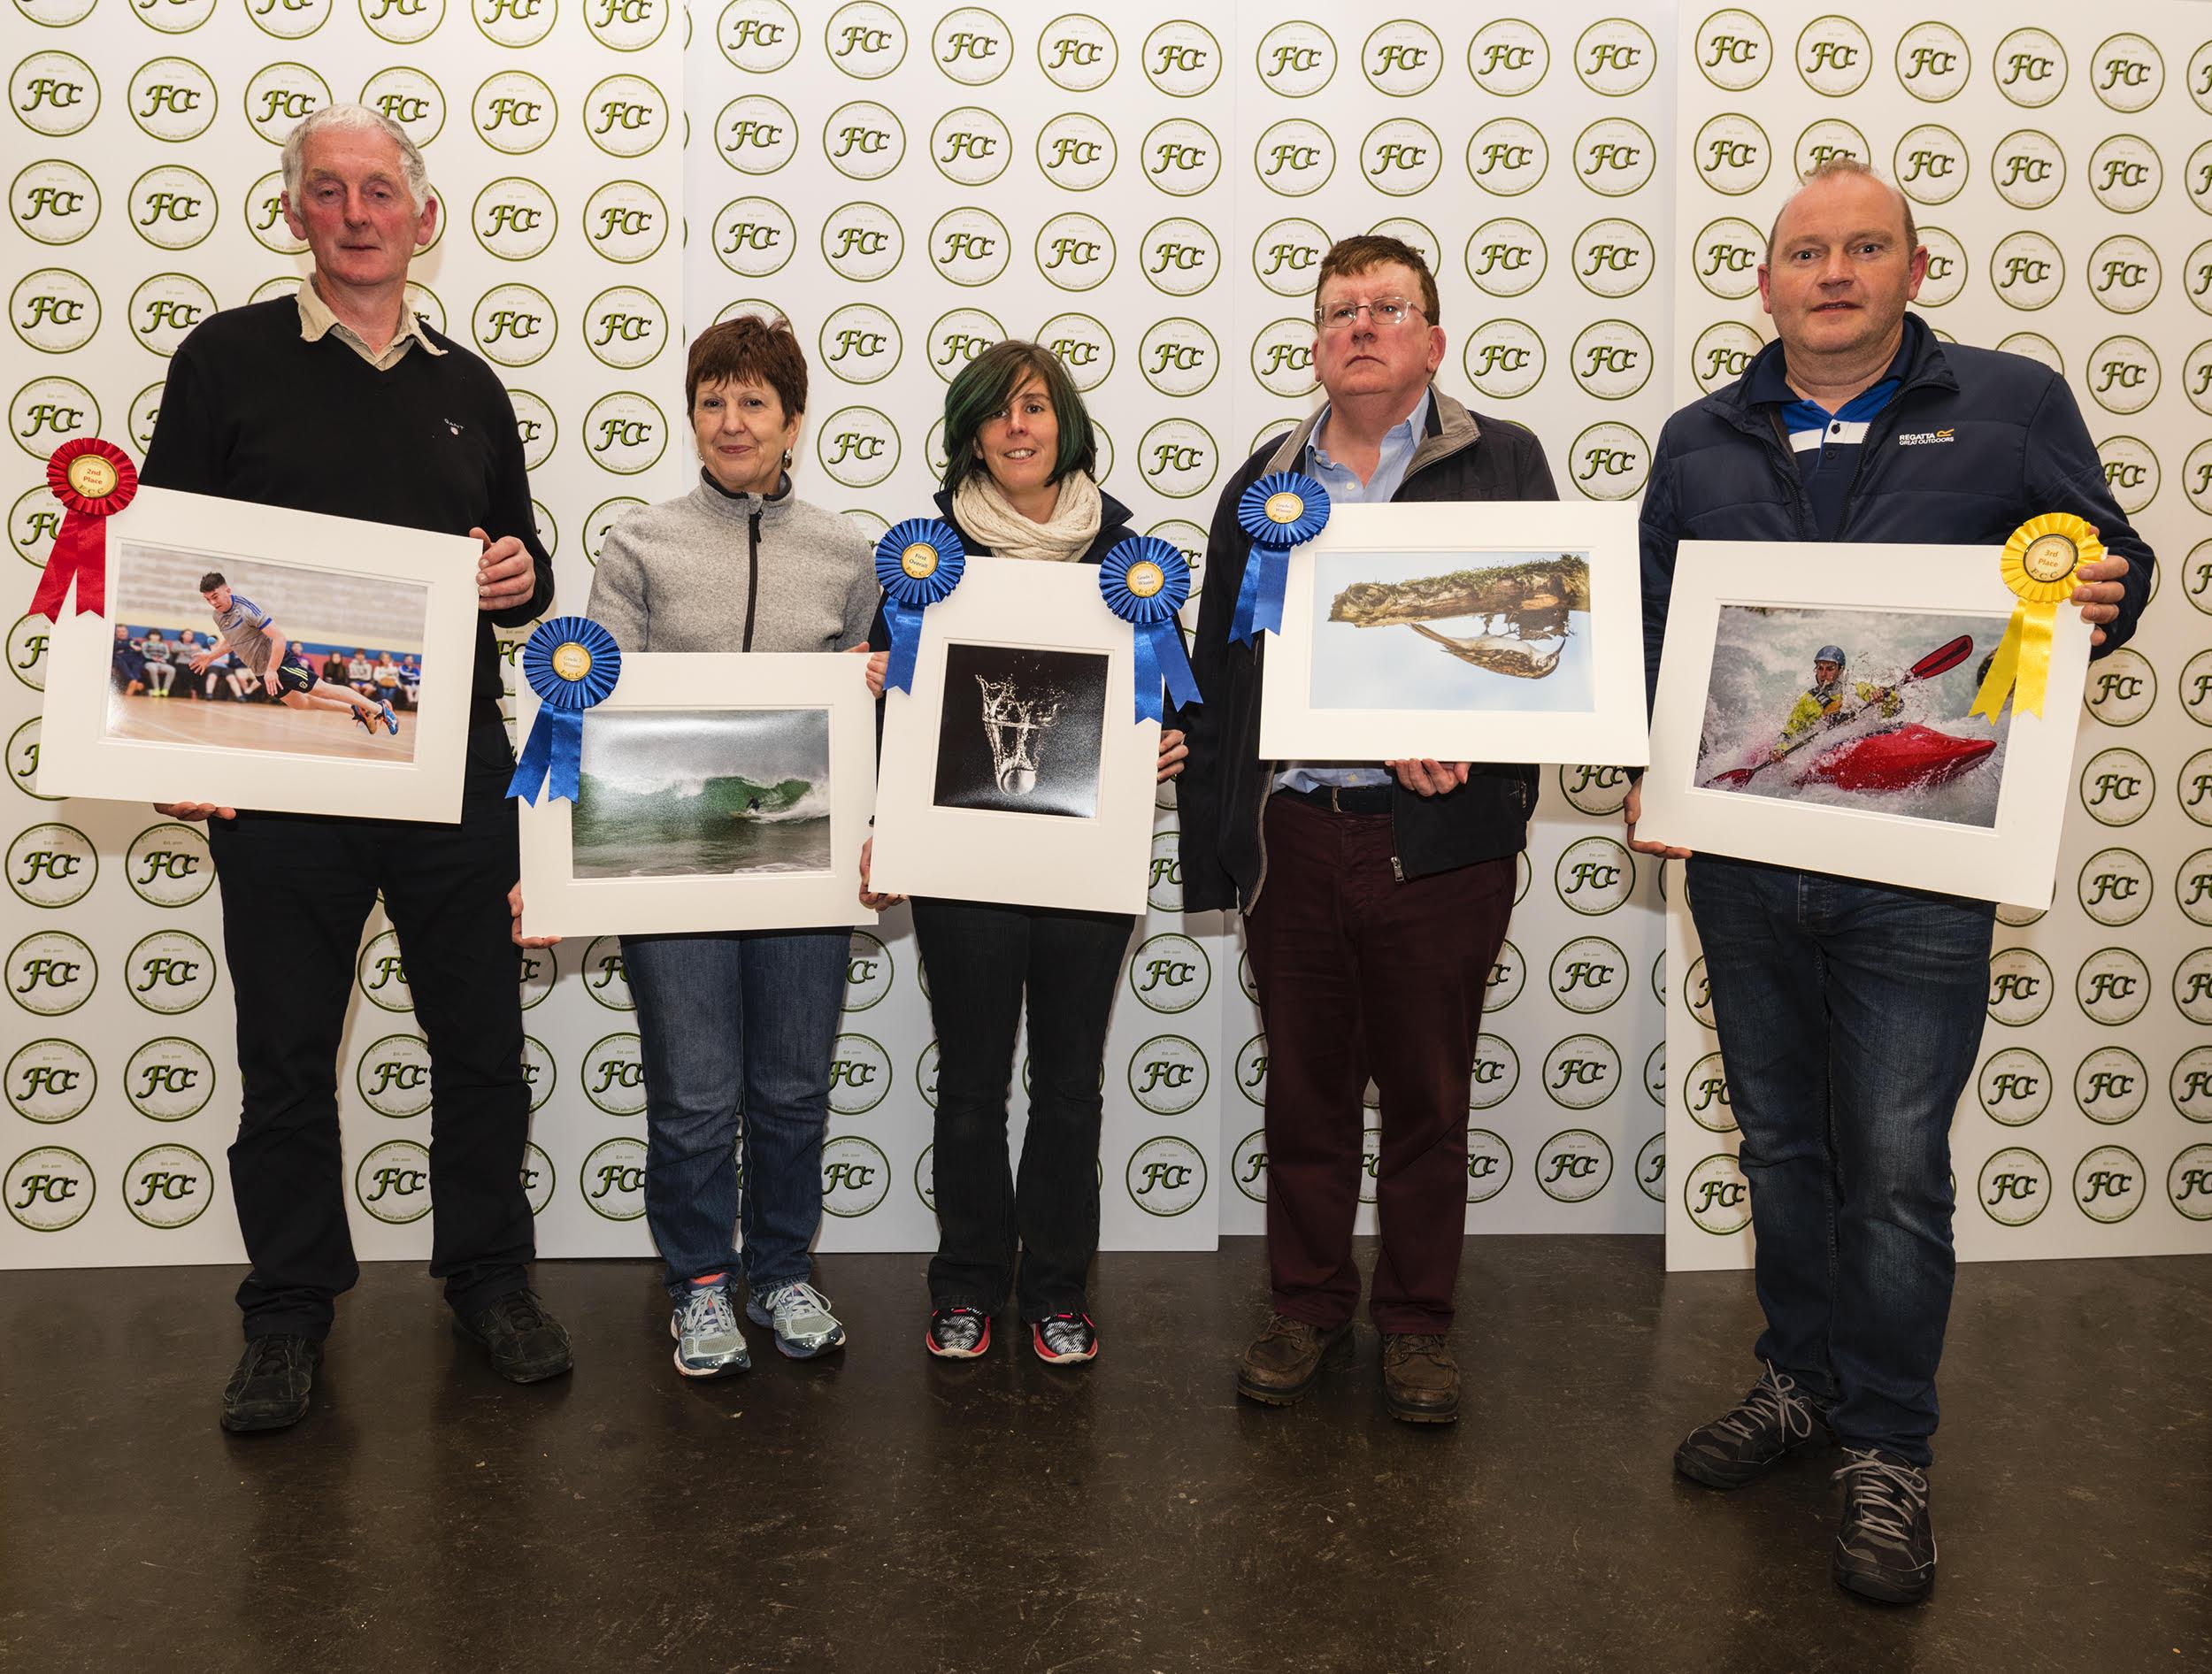 Tom Quish, Sheehan Hanrahan, Karen Fleming, Donagh Cronin, Finbarr O'Hanlon September winners @ FCC (Battie Arnold).jpg